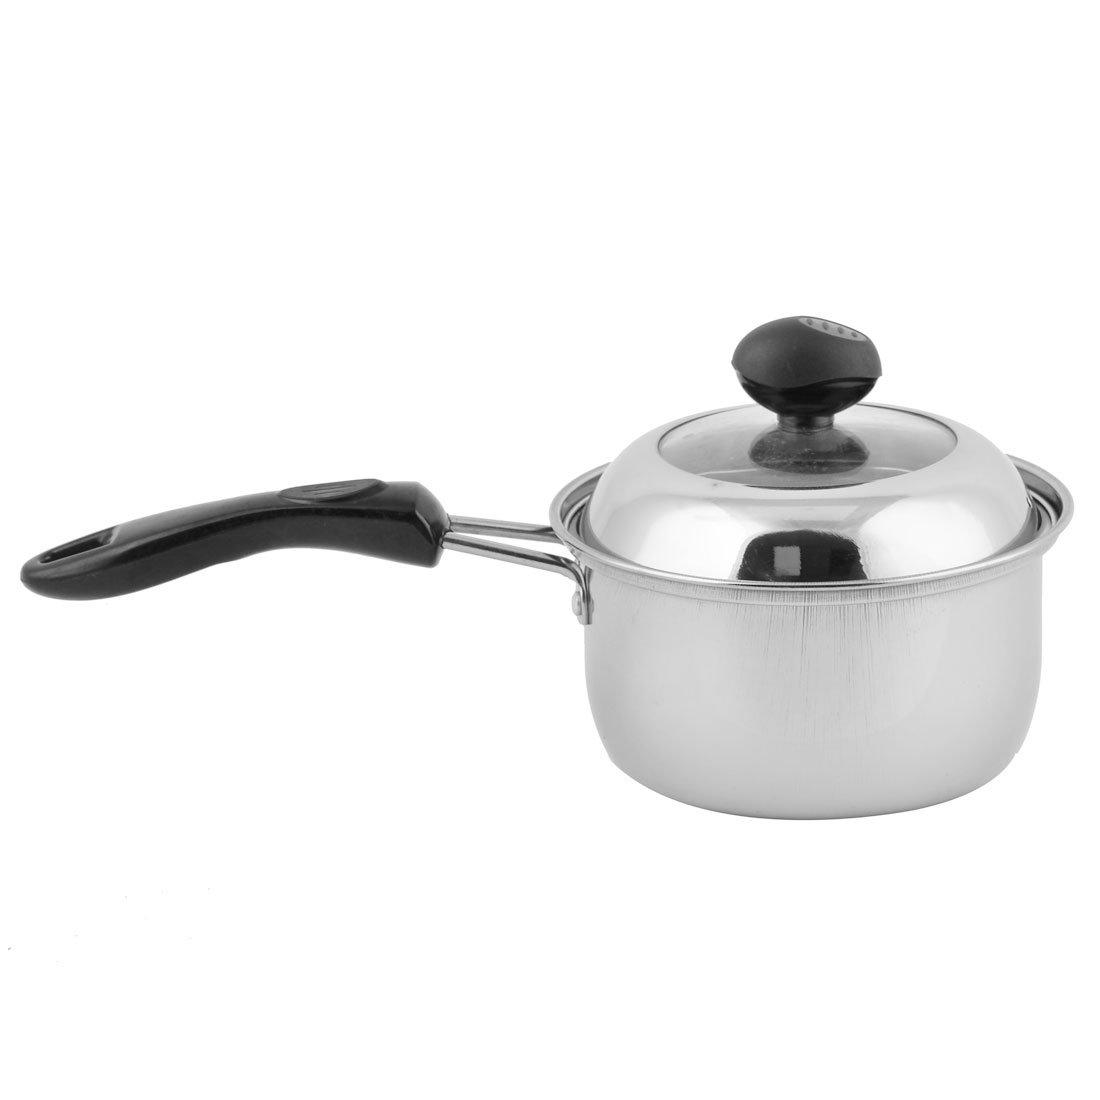 Sourcingmap Plastic Pressure Cooker Pot Pan Holder Handle Grip Handgrip 2pcs Black